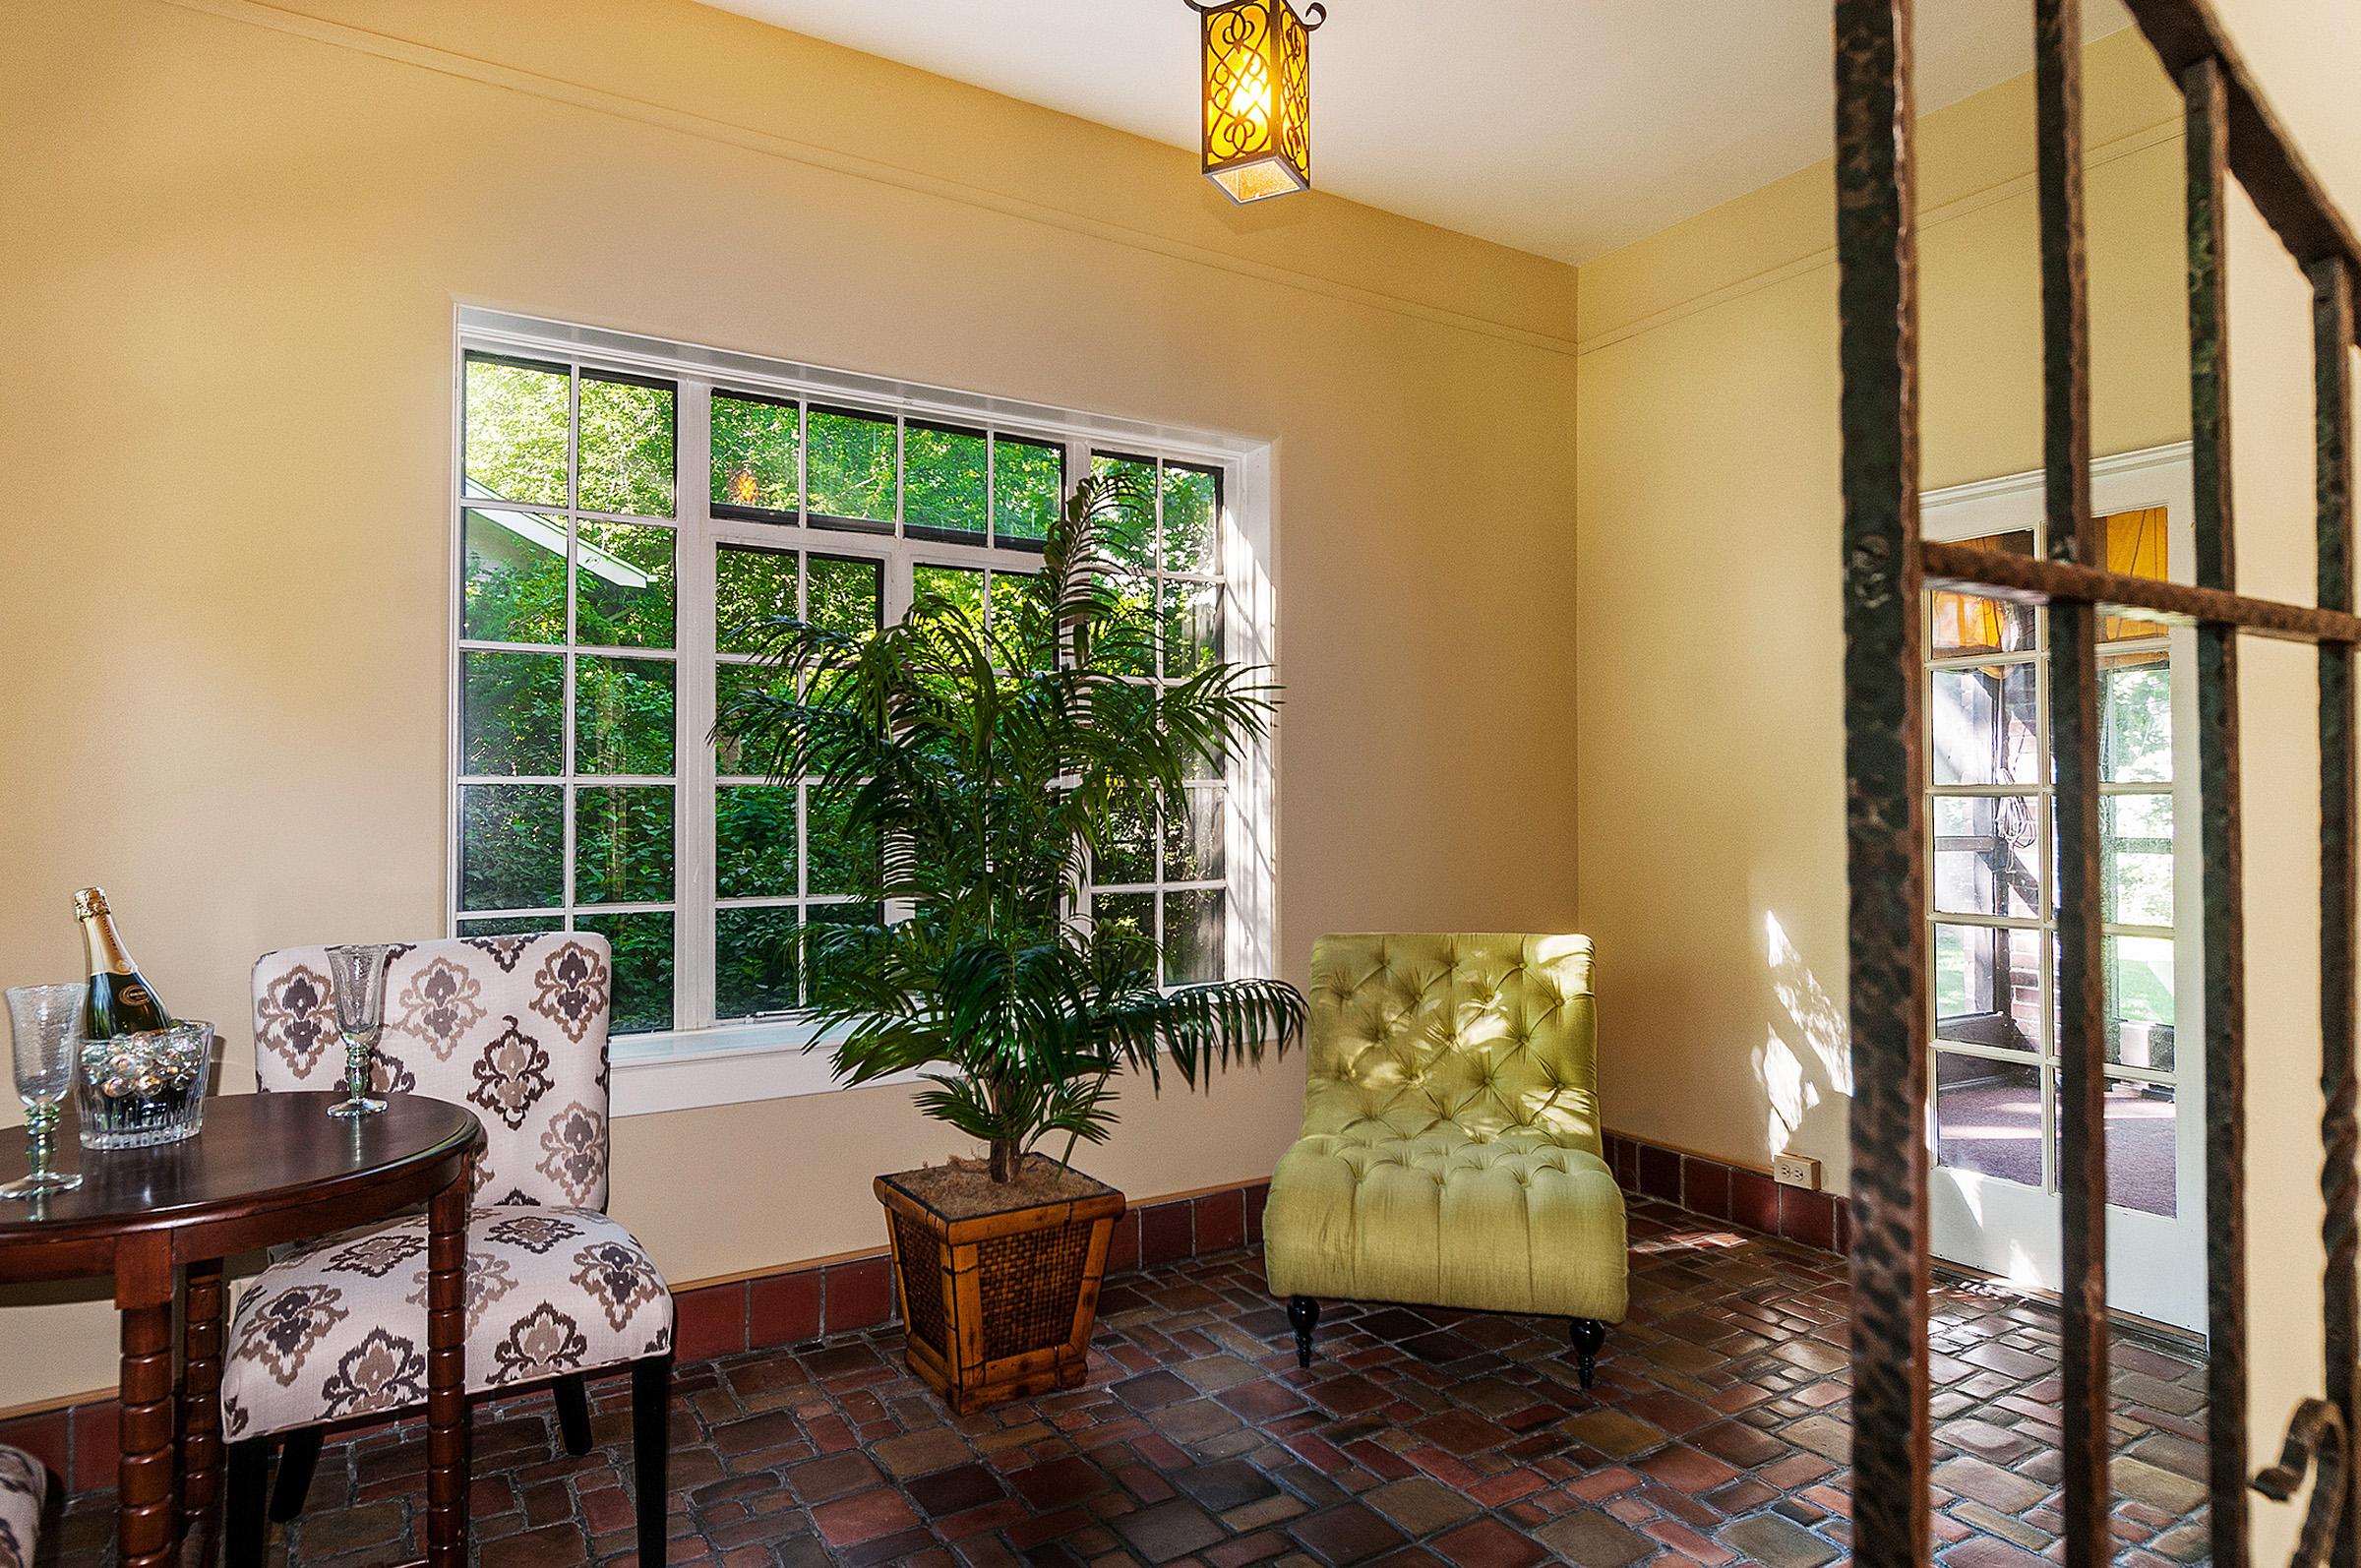 1087678_Sun-Room-has-Original-Tile-Floor_high.jpg